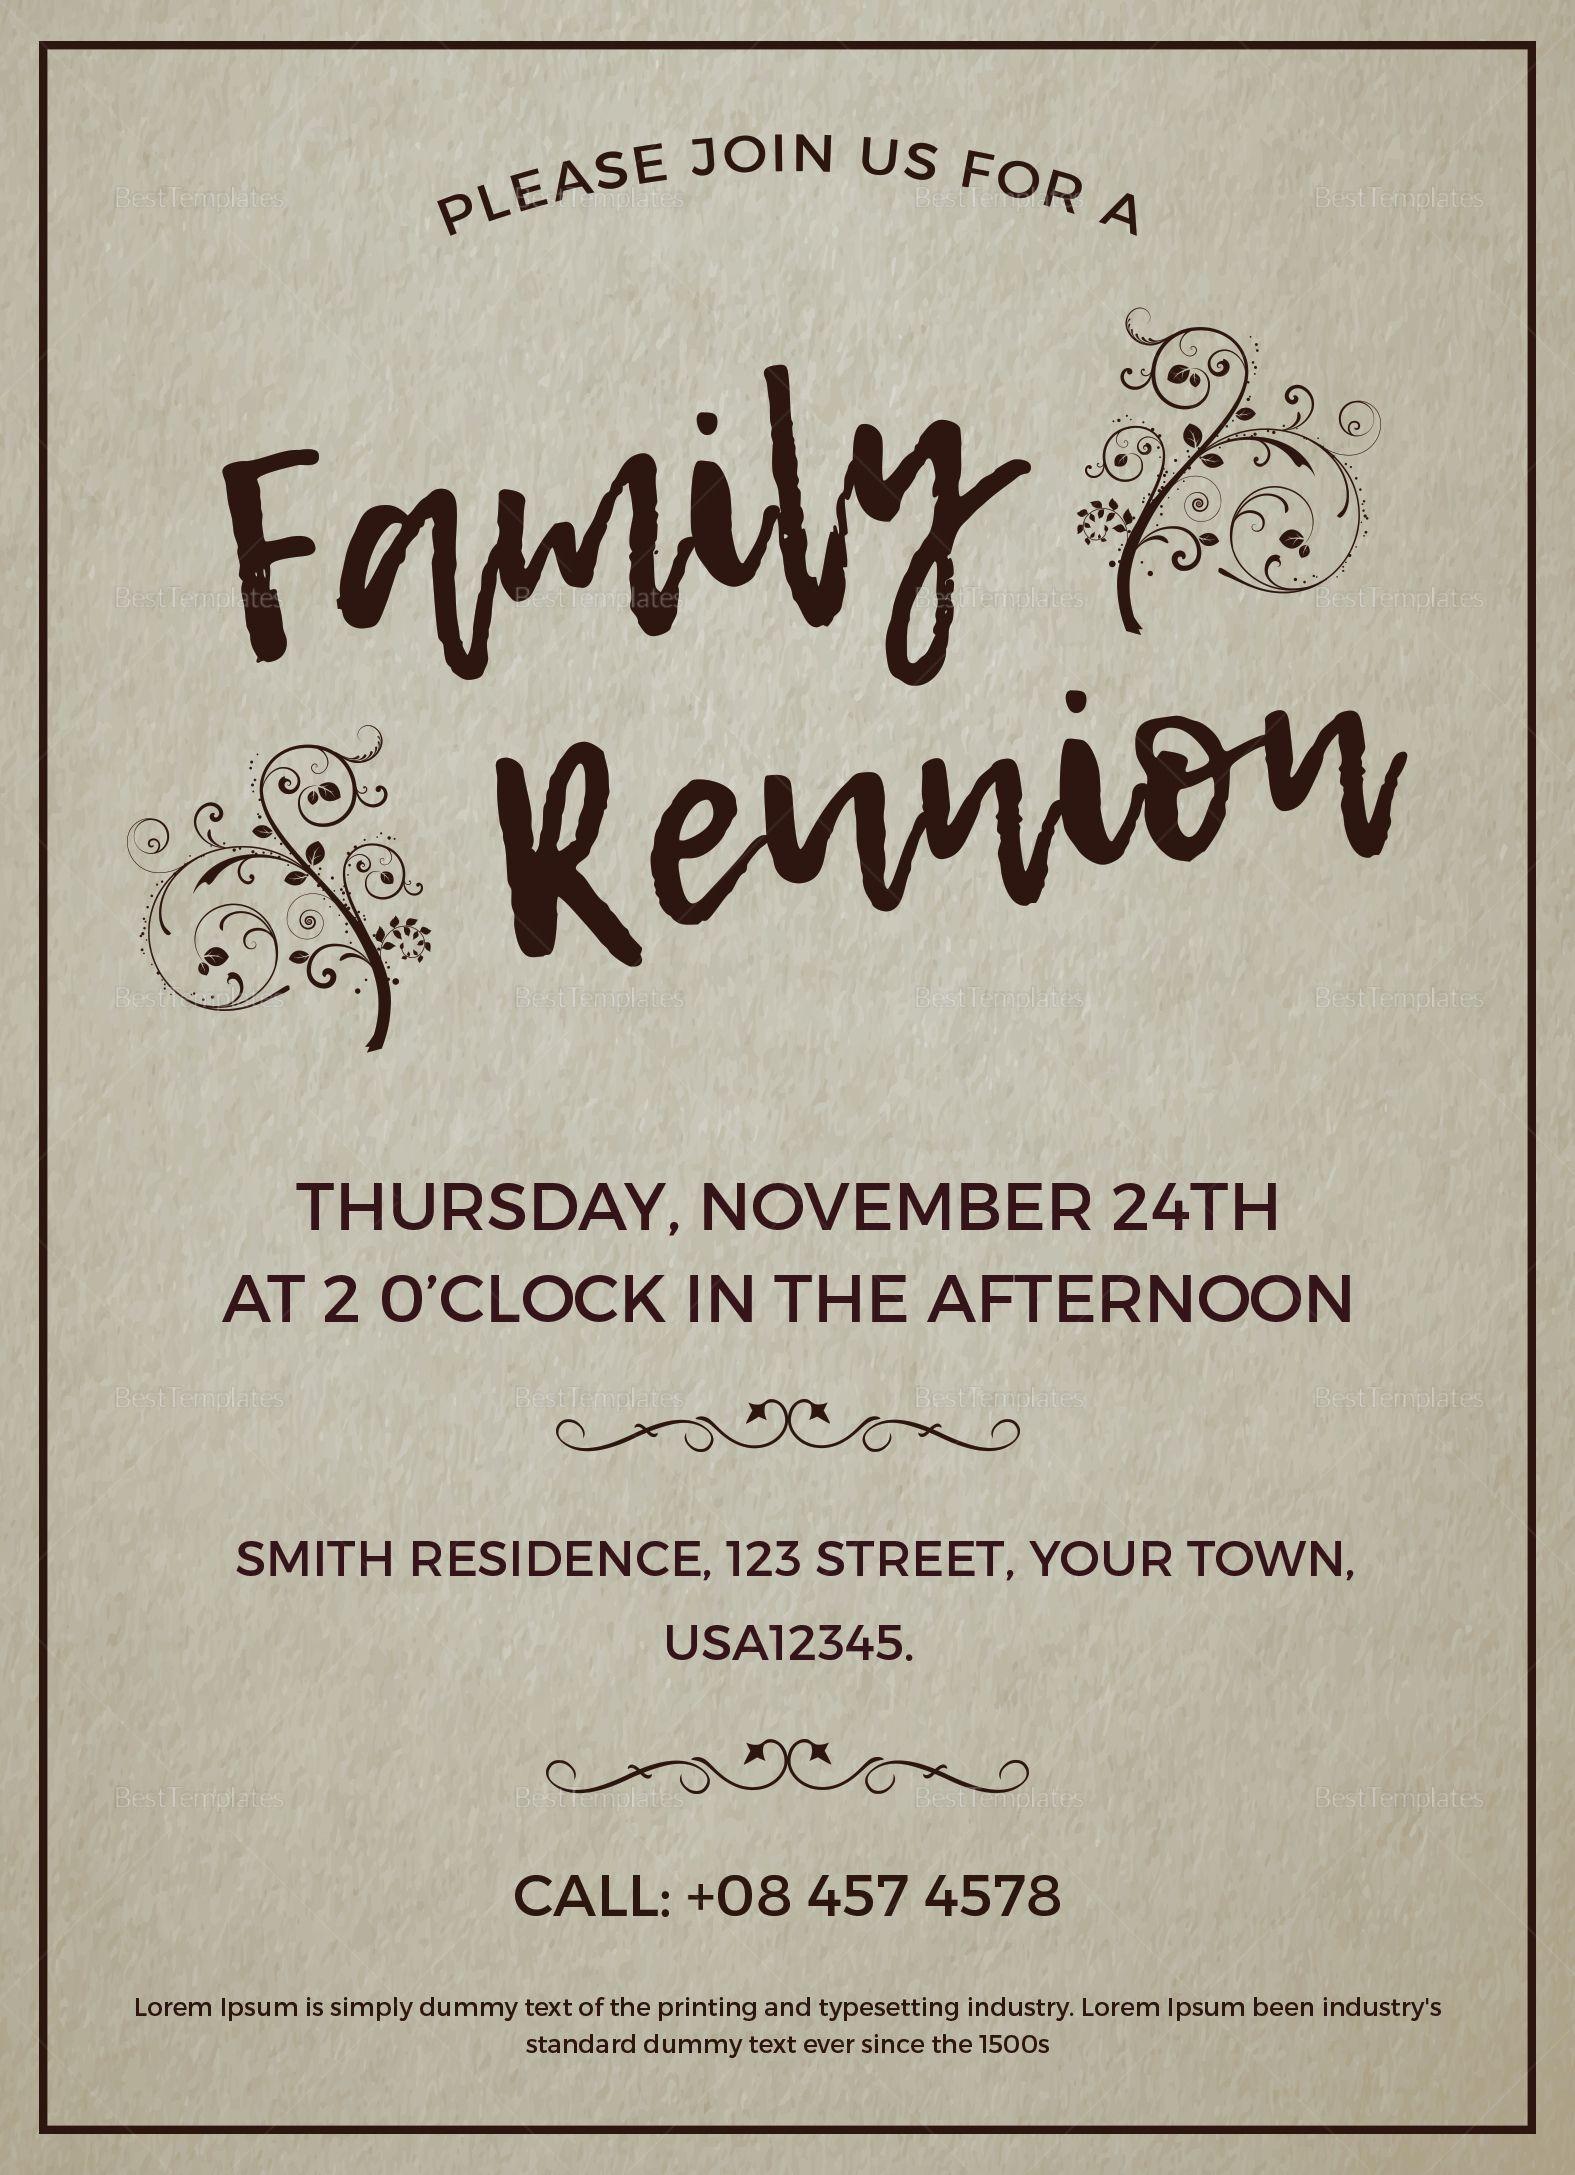 002 Imposing Free Printable Family Reunion Invitation Template Photo  Templates FlyerFull